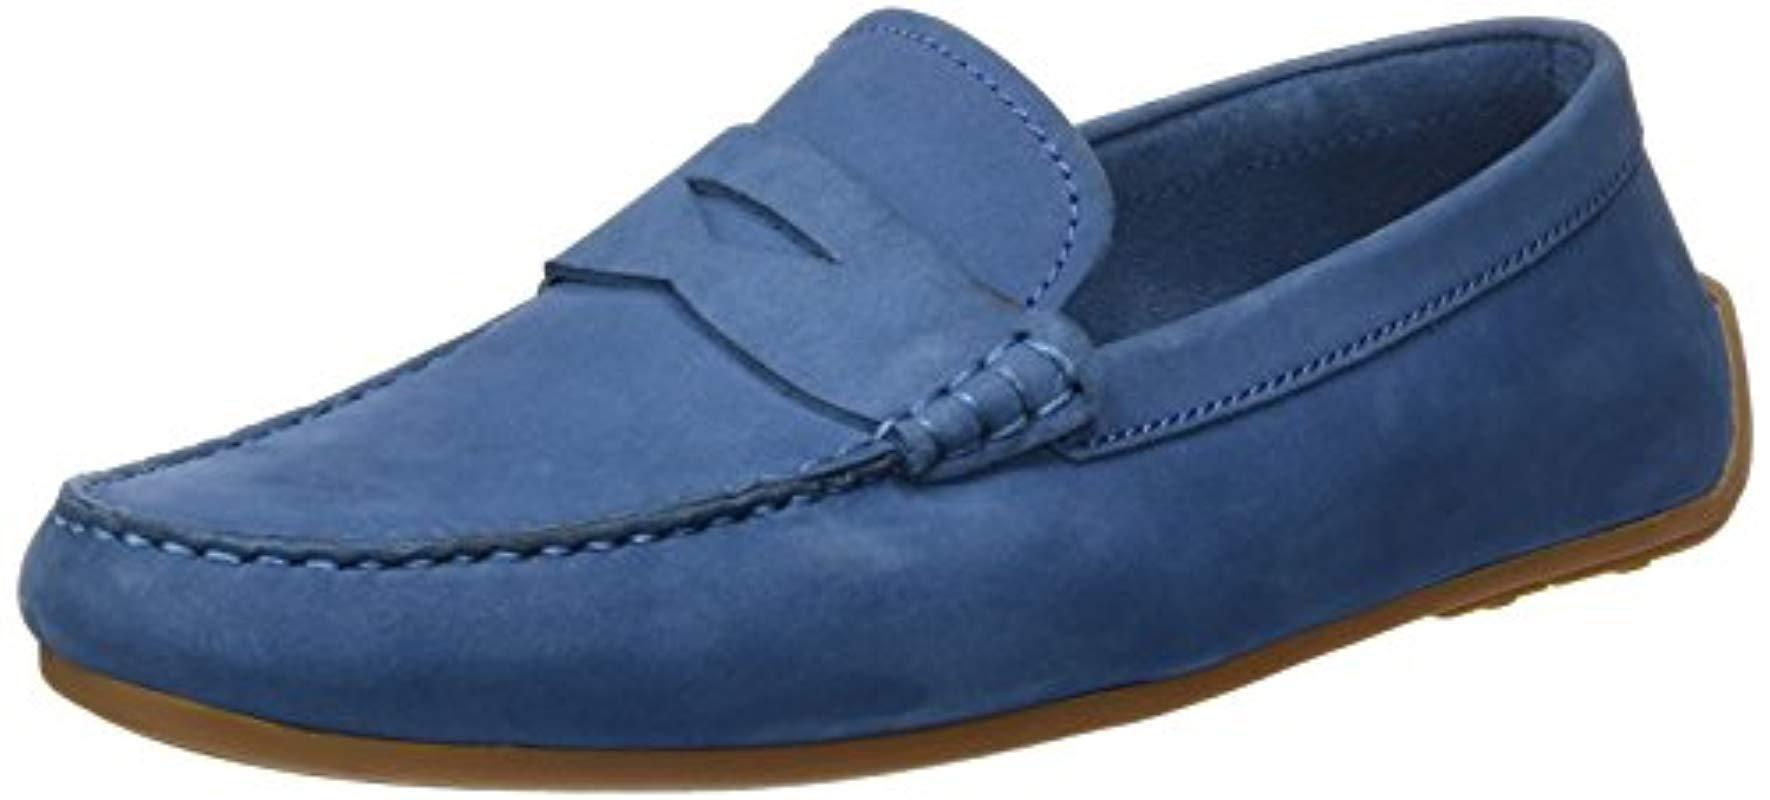 6efea42359c7dd clarks-Blue-Blue-Nubuck-s-Reazor-Drive-Mocassins.jpeg